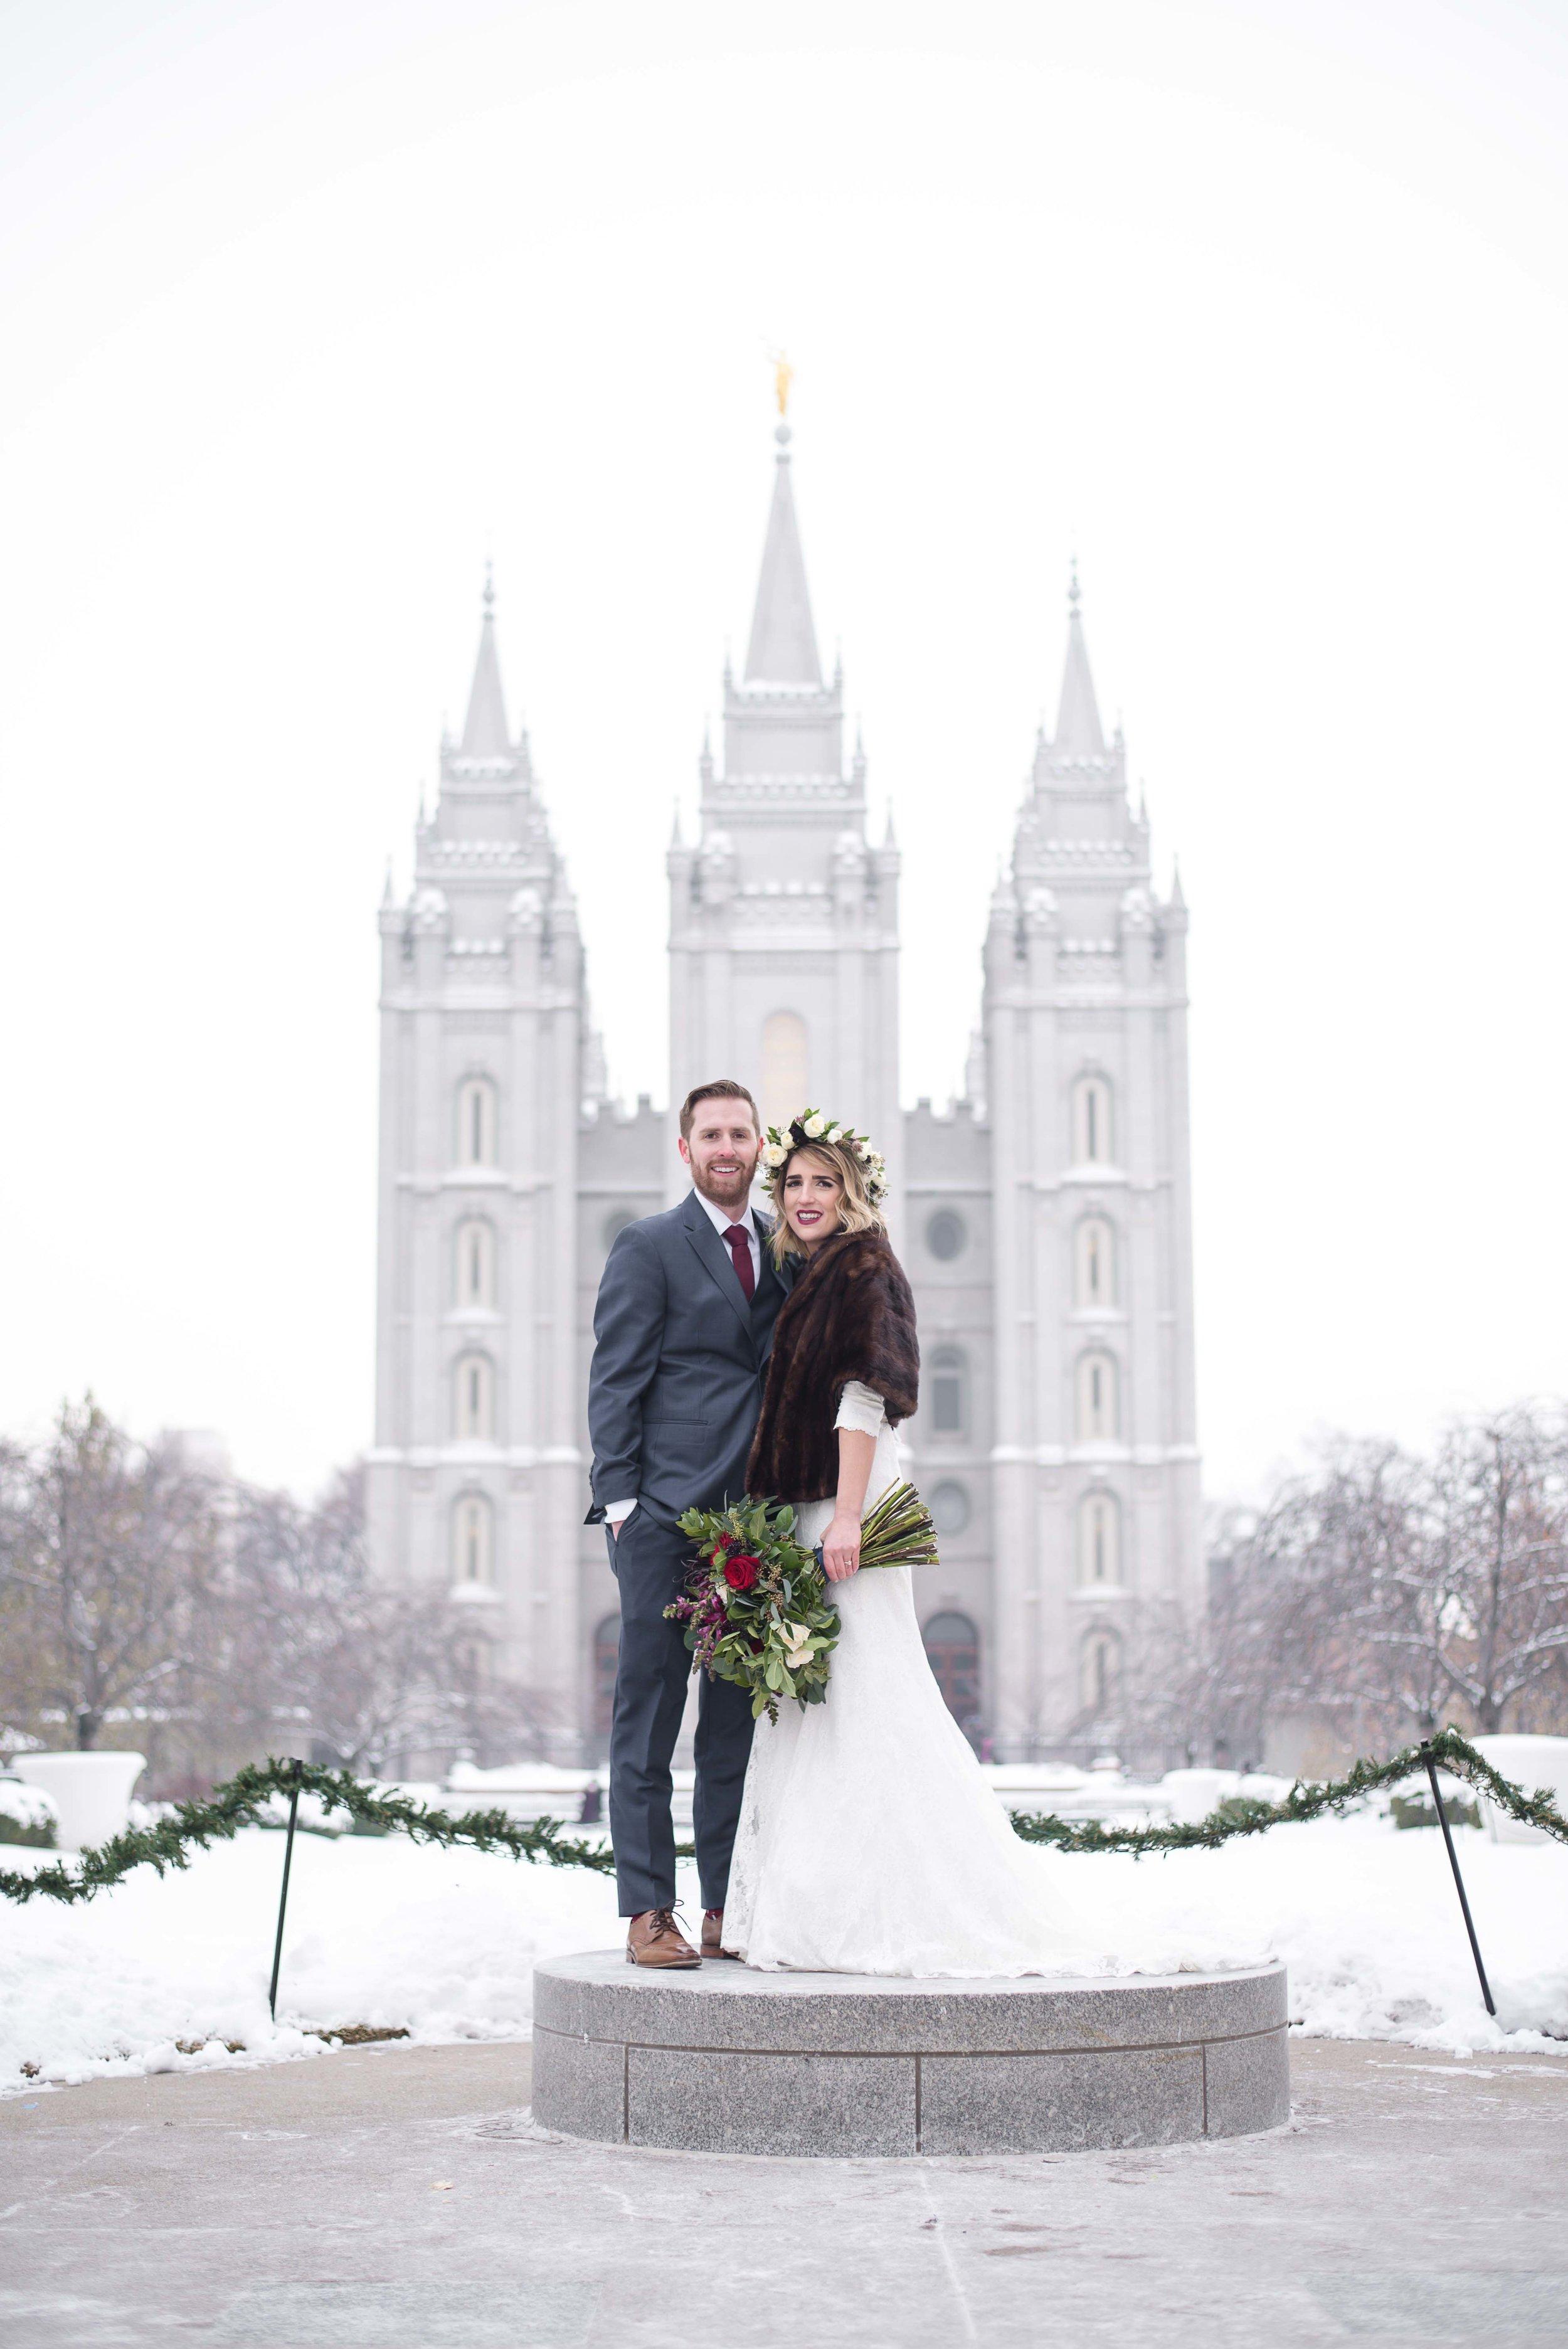 Tess+Garrett-Wedding-Day-Sadie-Banks-Photography-173.jpg